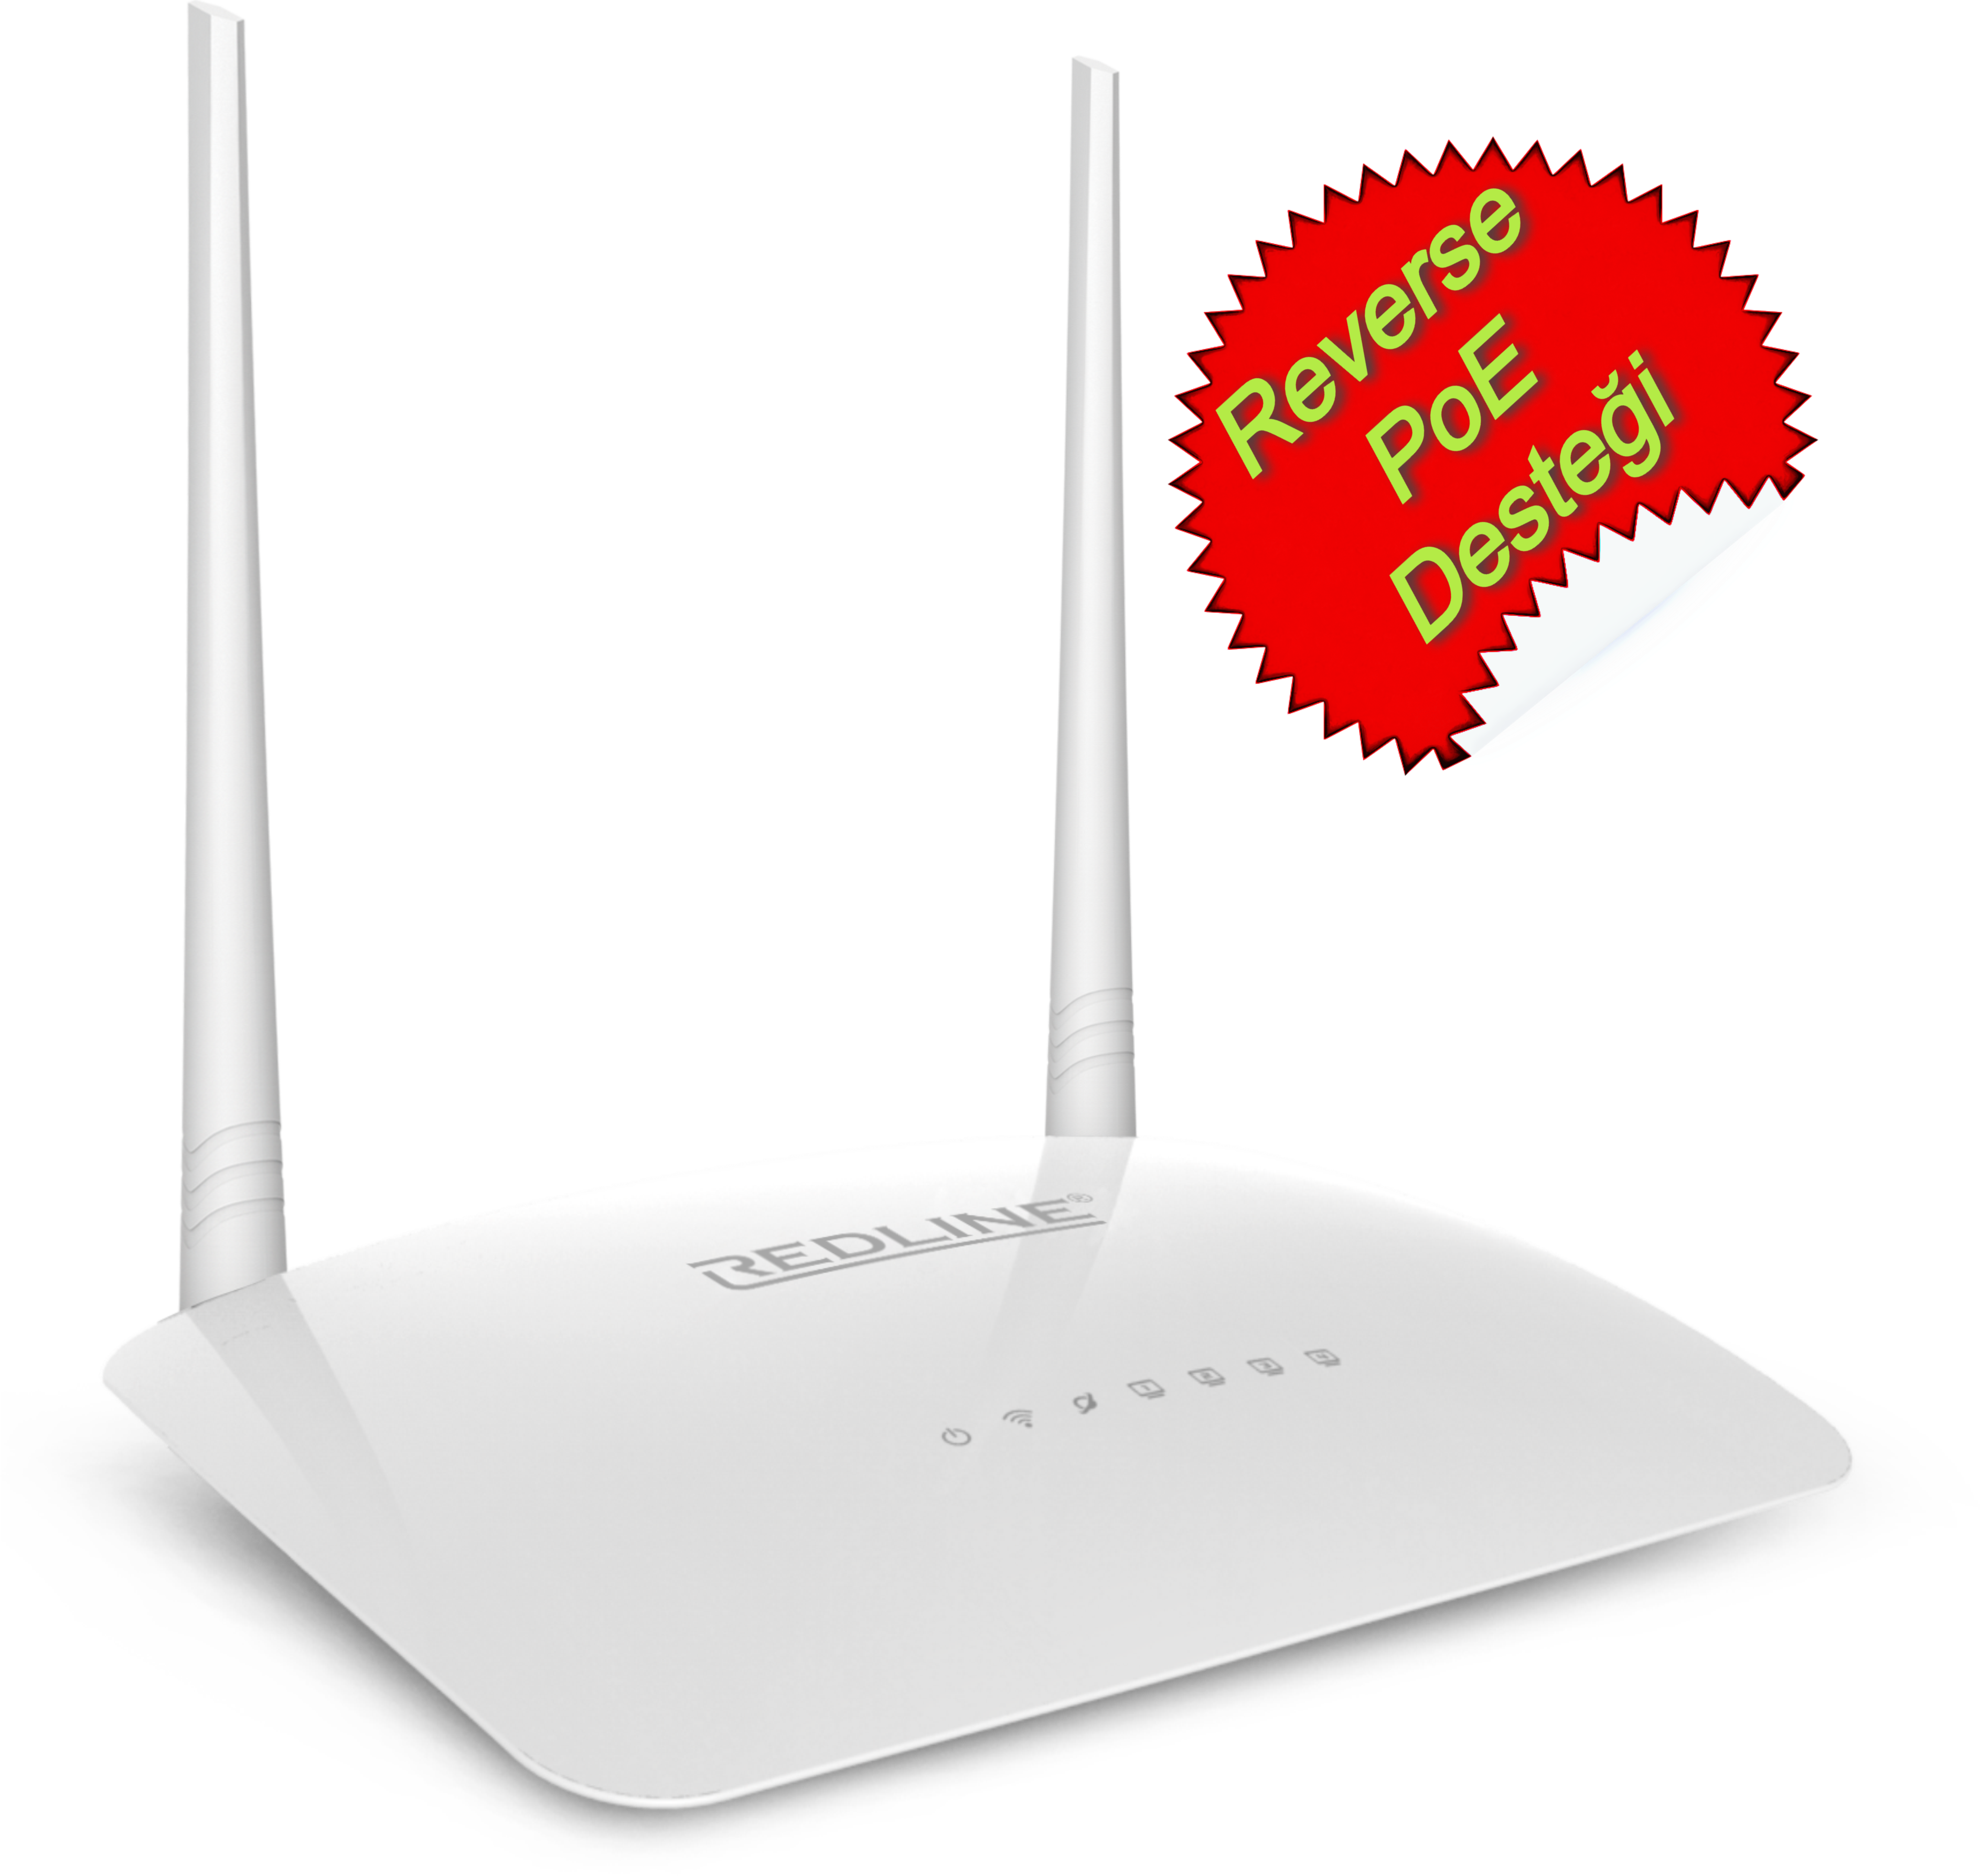 RL-WR1220P REDLINE RL-WR1220P PoE 24V WPS + WISP+WDS 300 Mbps Repeater+Access Point+Bridge Kablosuz Router